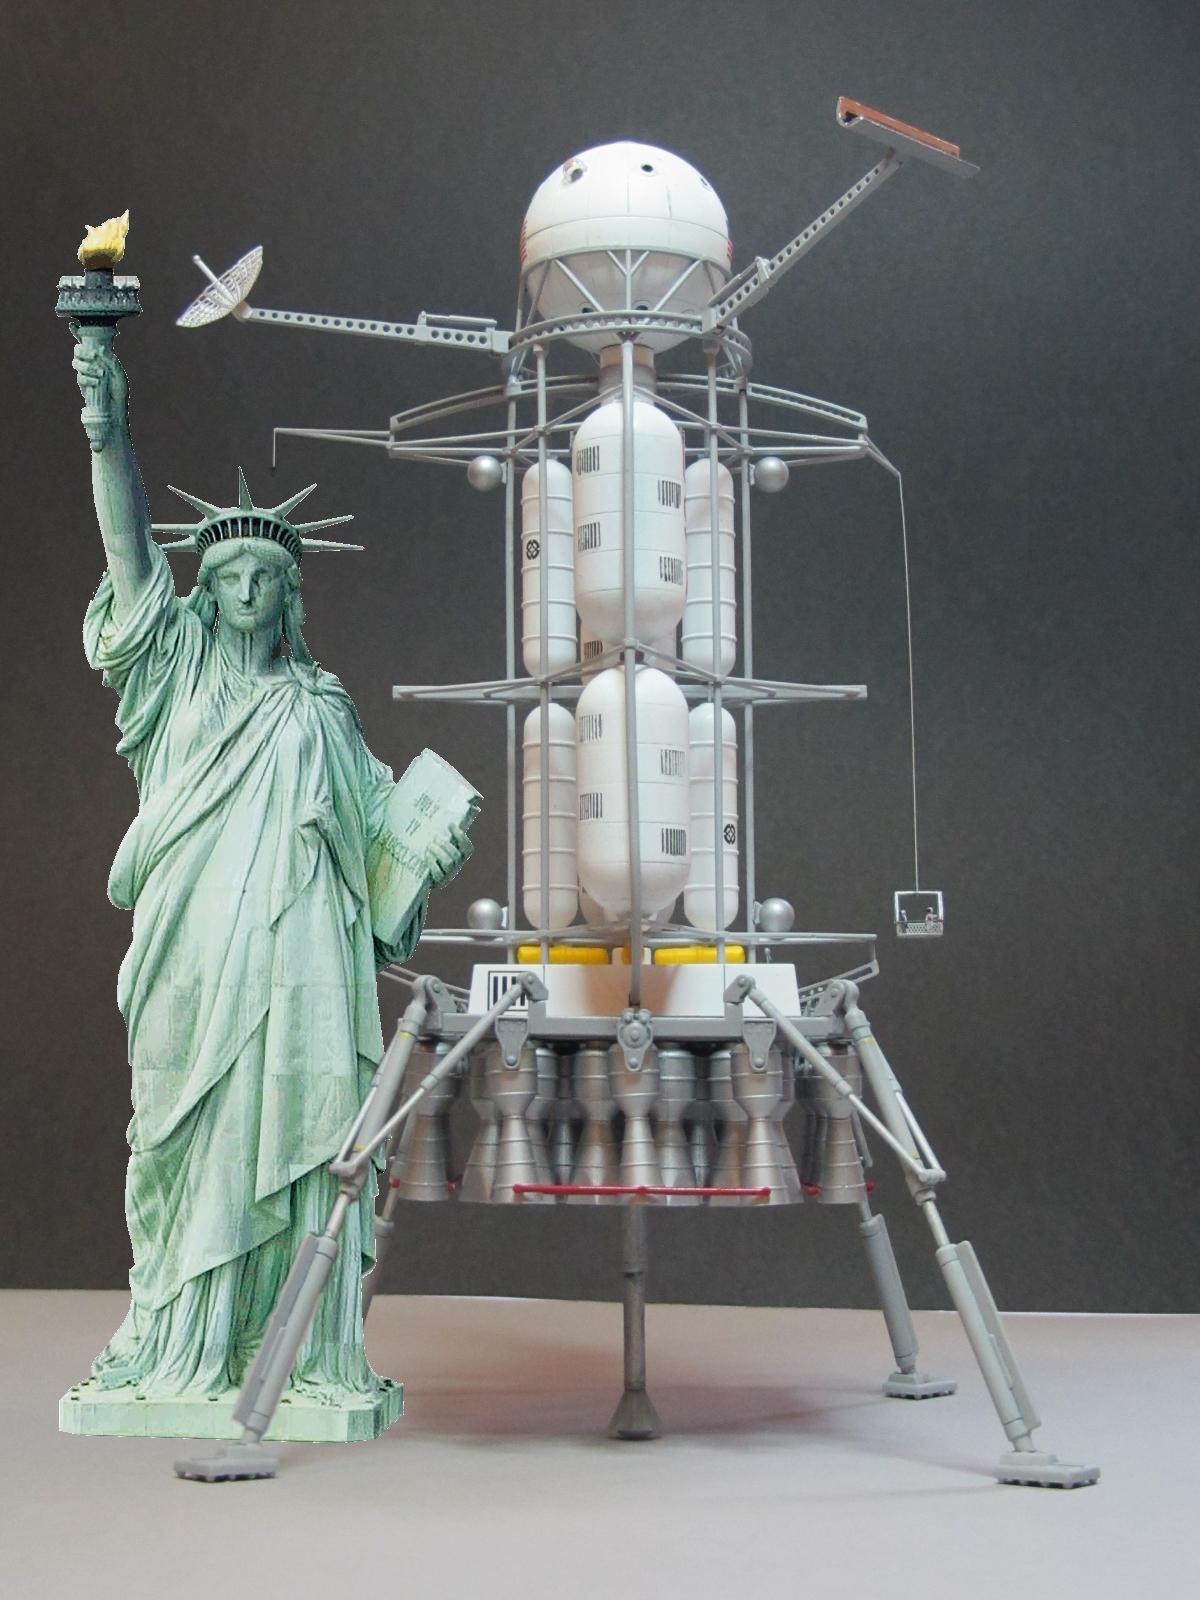 Click image for larger version.  Name:liberty lander.jpg Views:19 Size:1.04 MB ID:24561